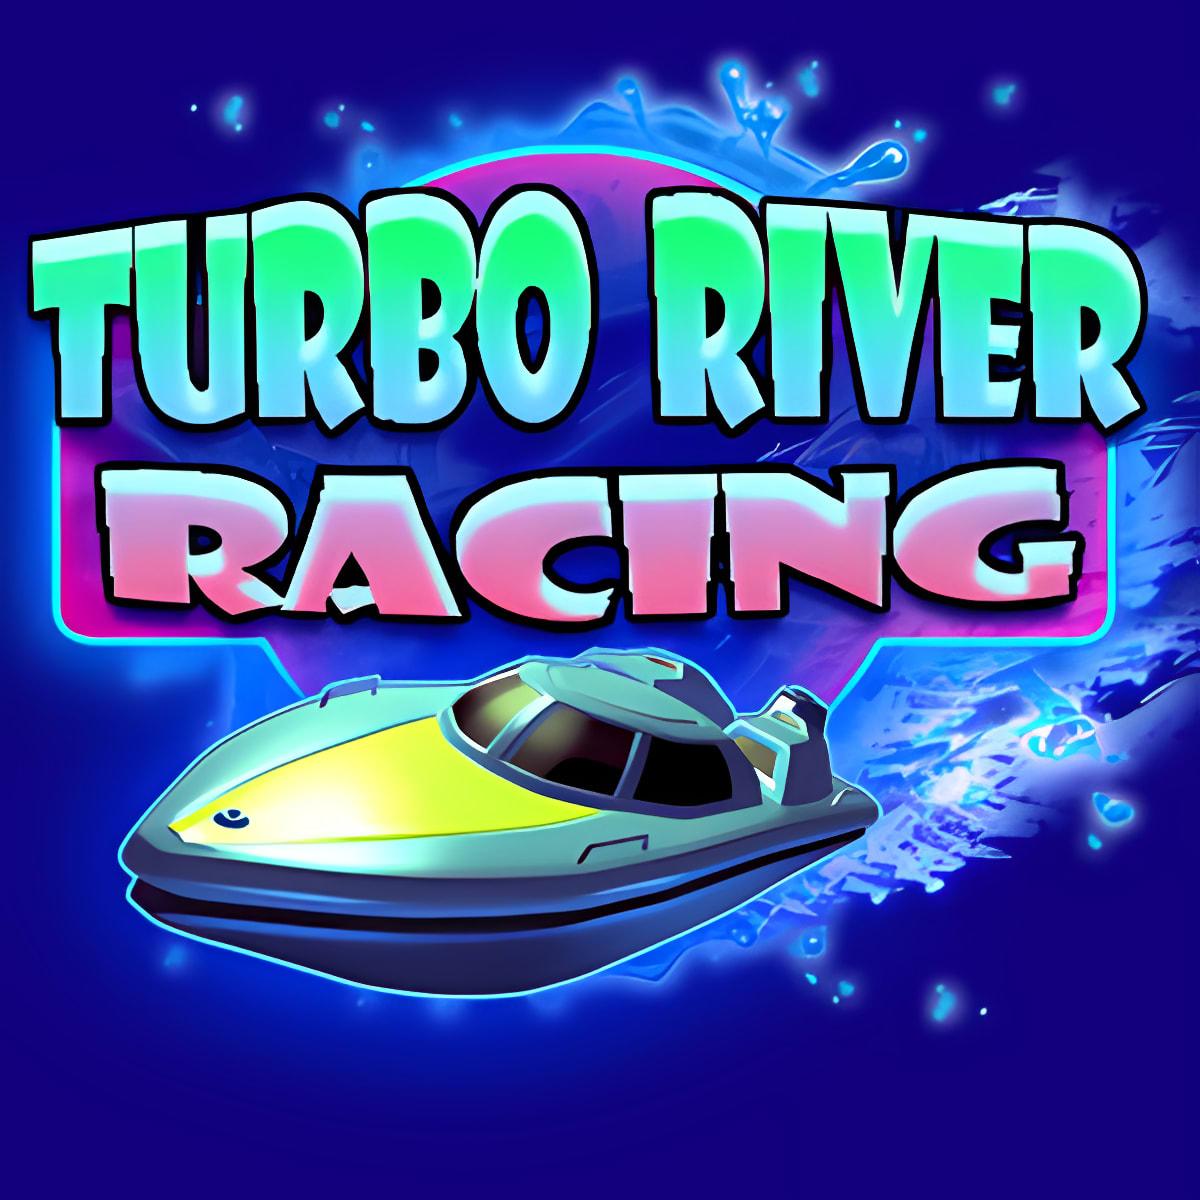 Turbo River Racing Pd 1.00